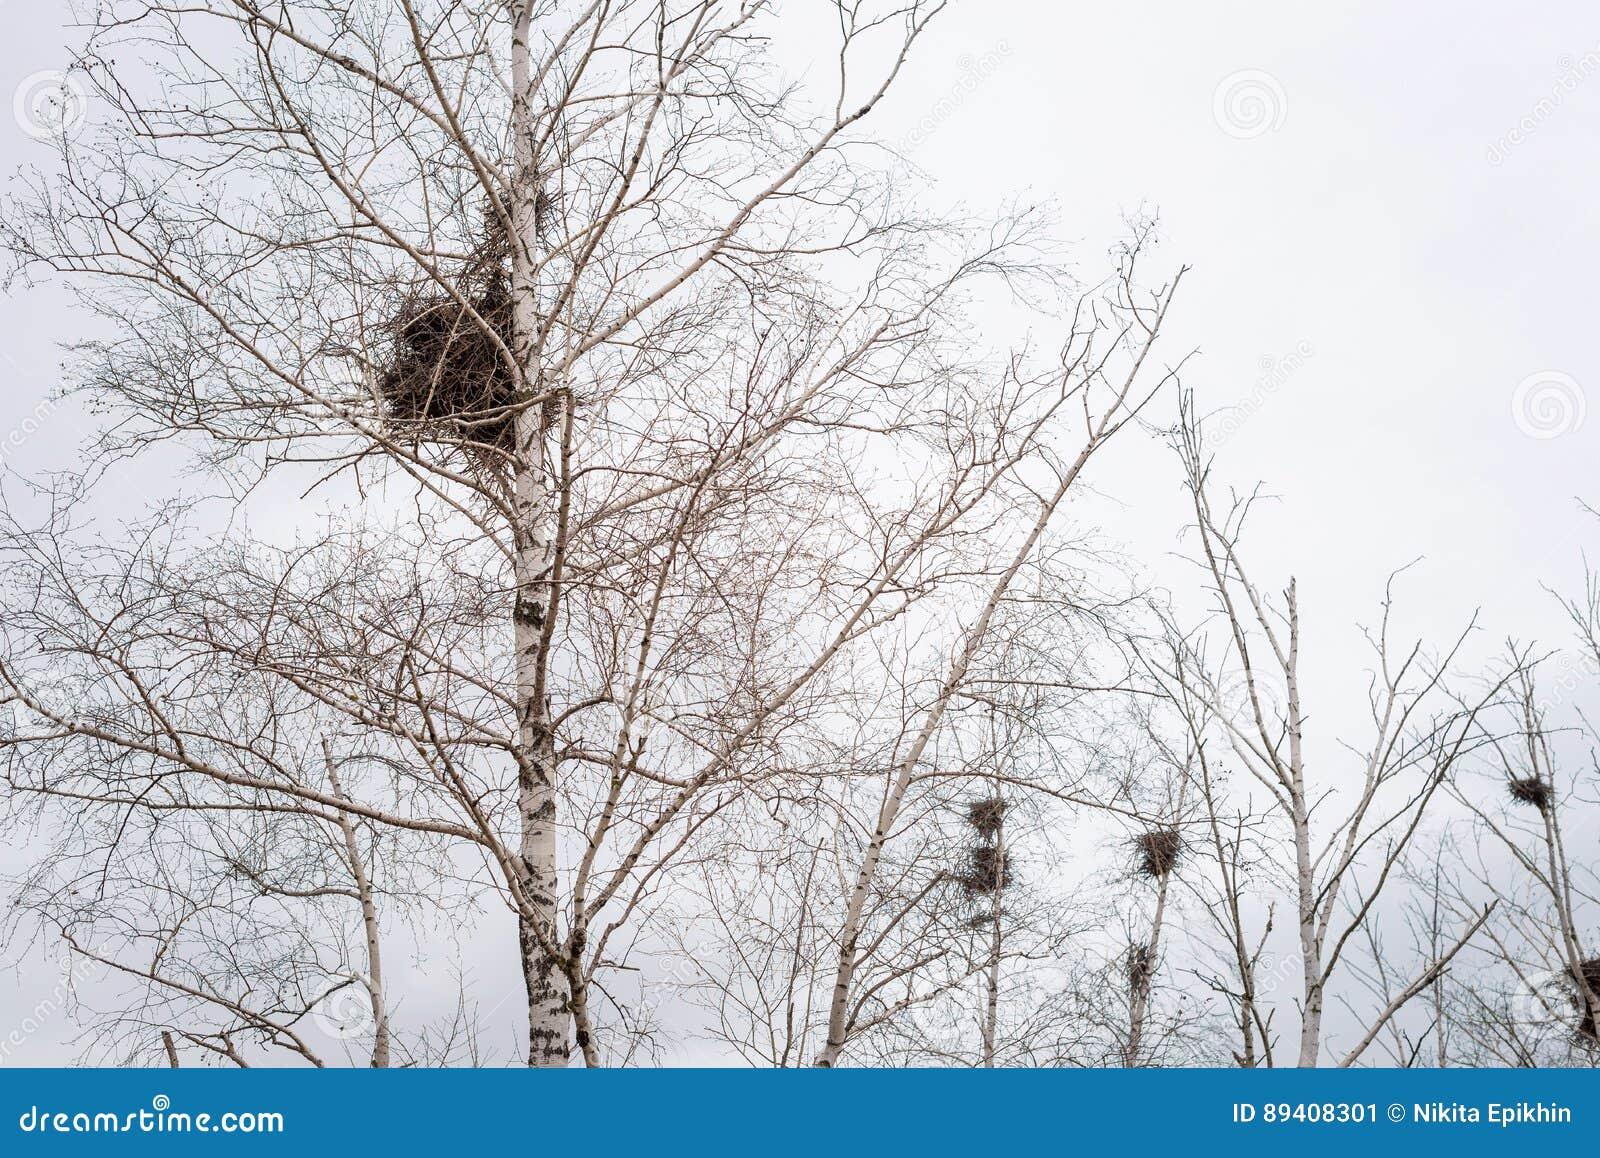 Empty bird`s nest in branches of birch tree in March